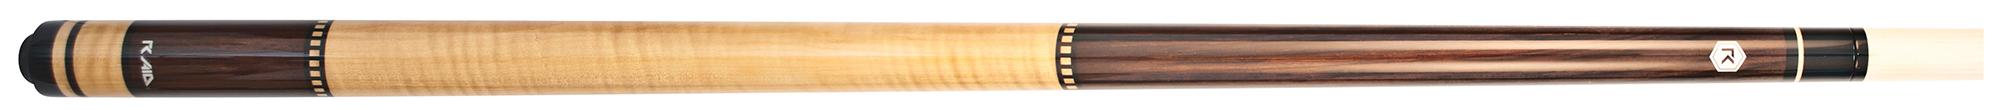 CK1205: RAID RD-2 maple/rosewood #1